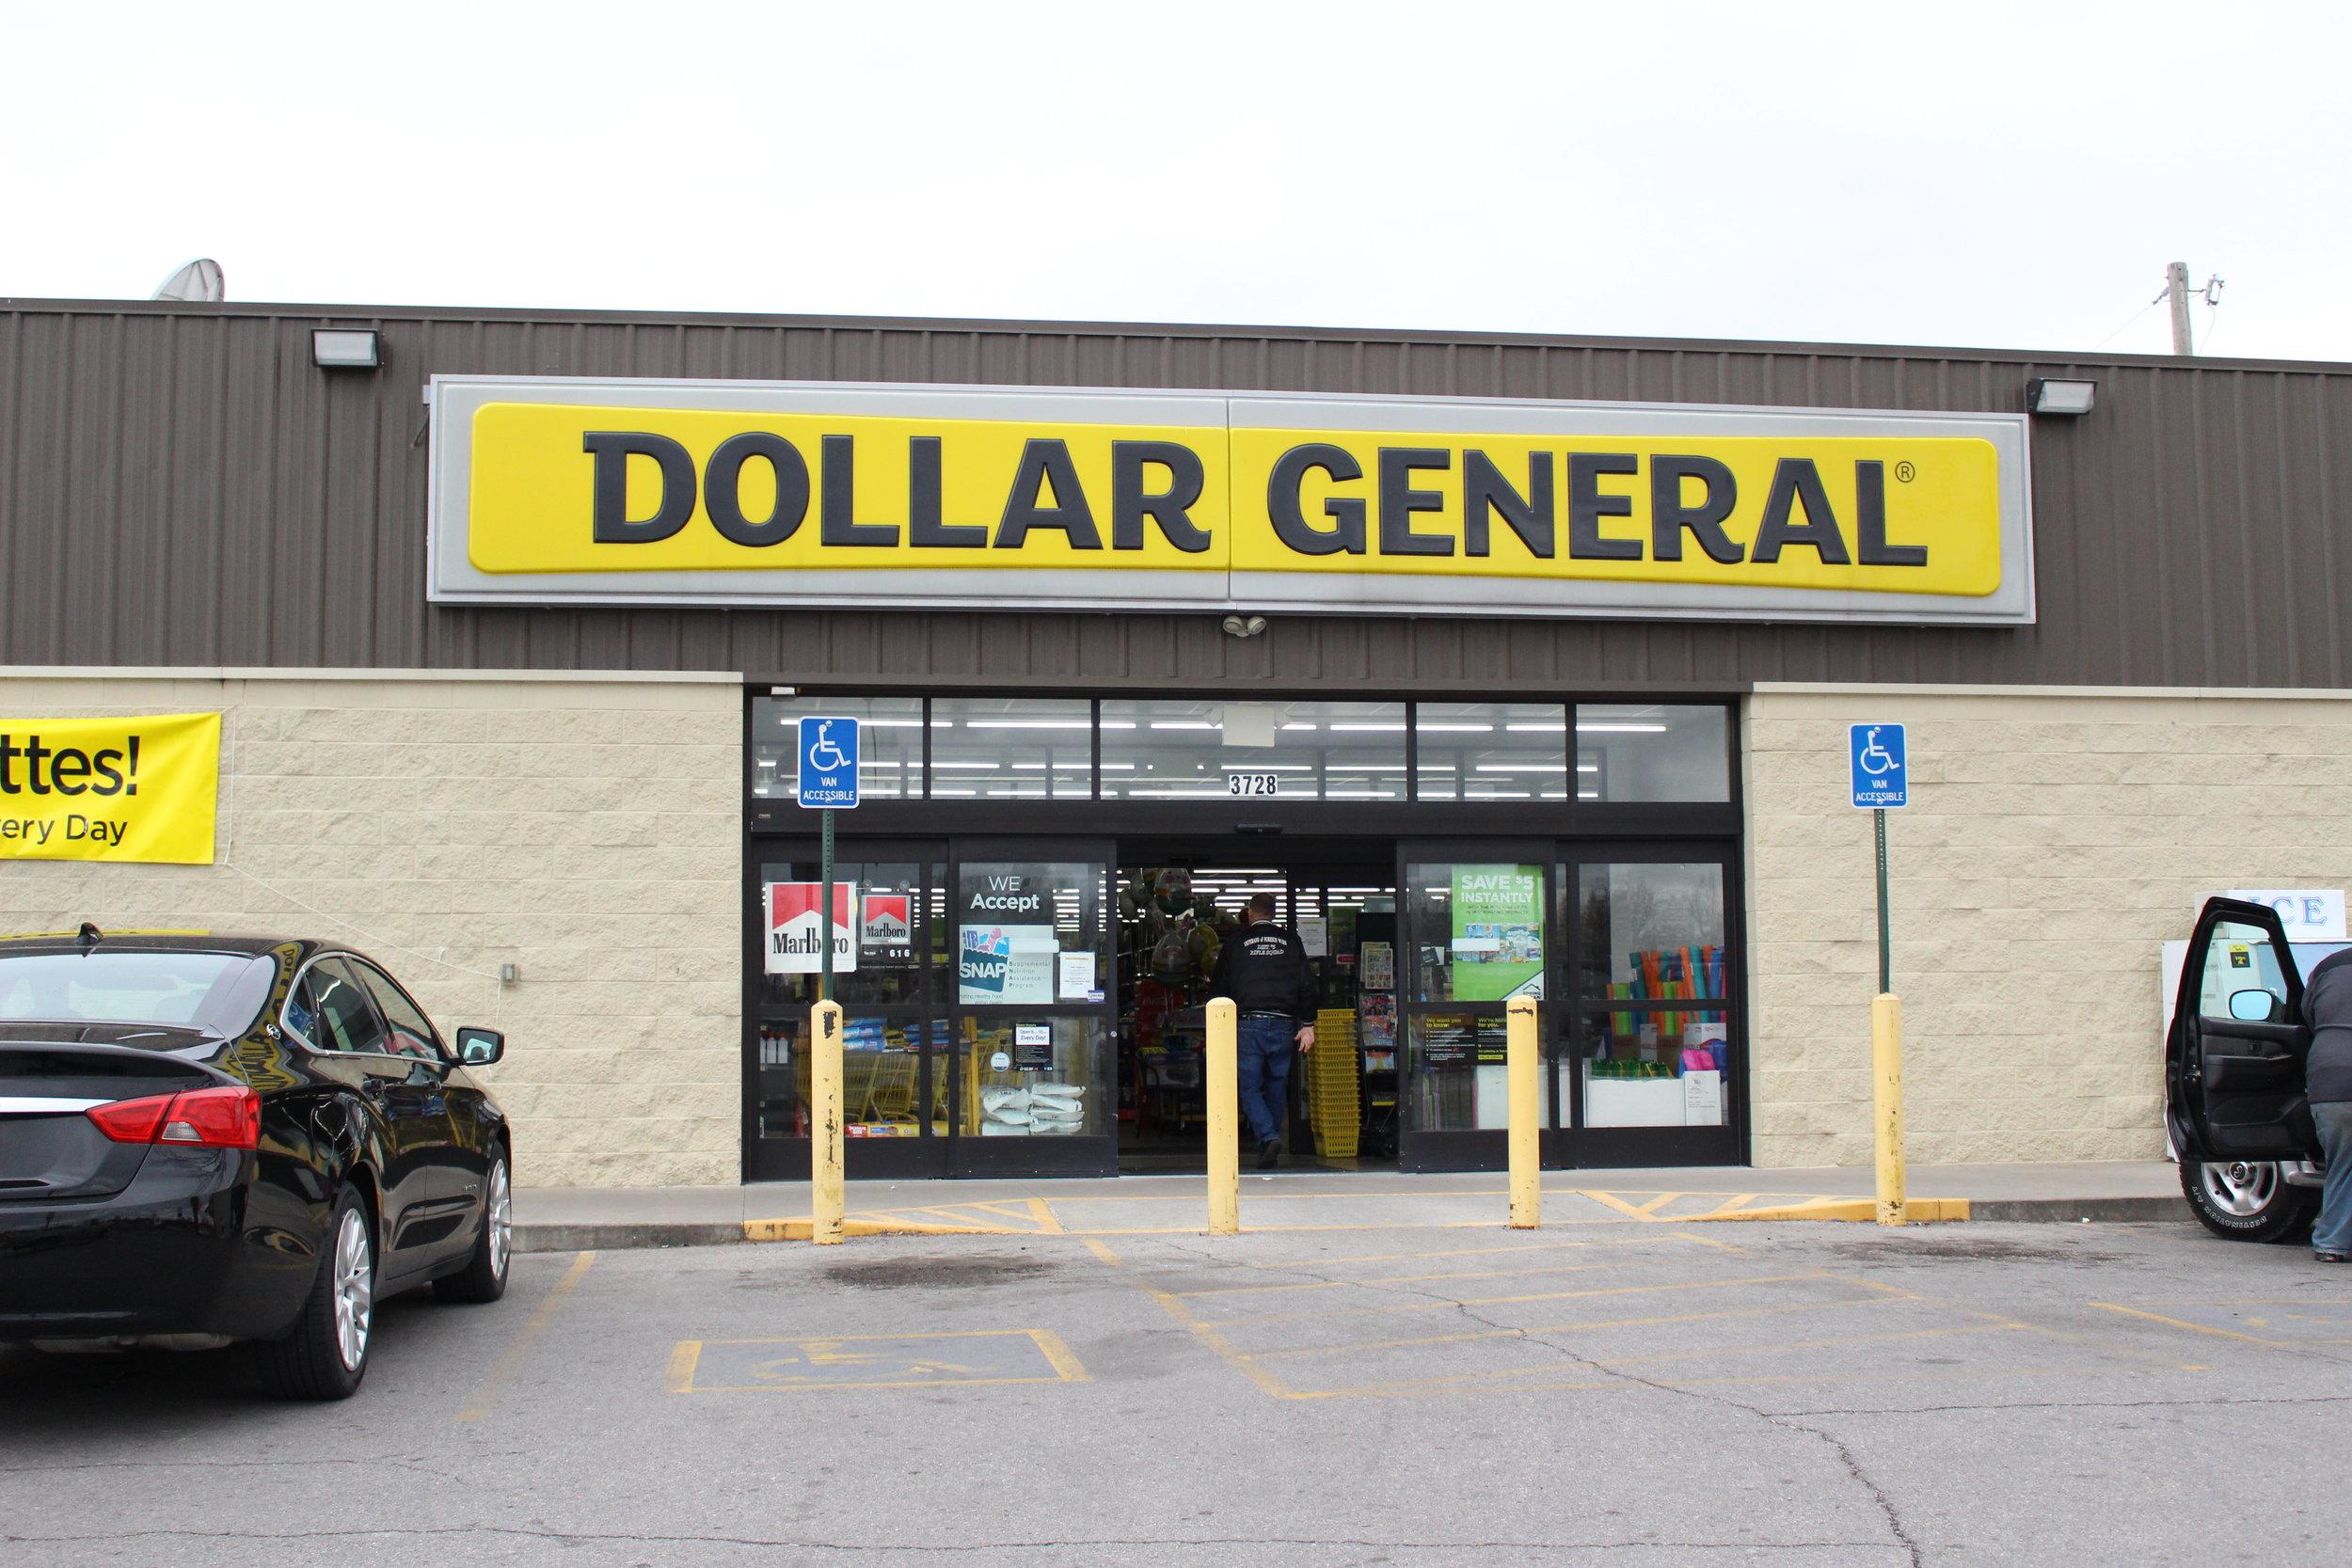 Dollar general - prattville 3728 south highway 97